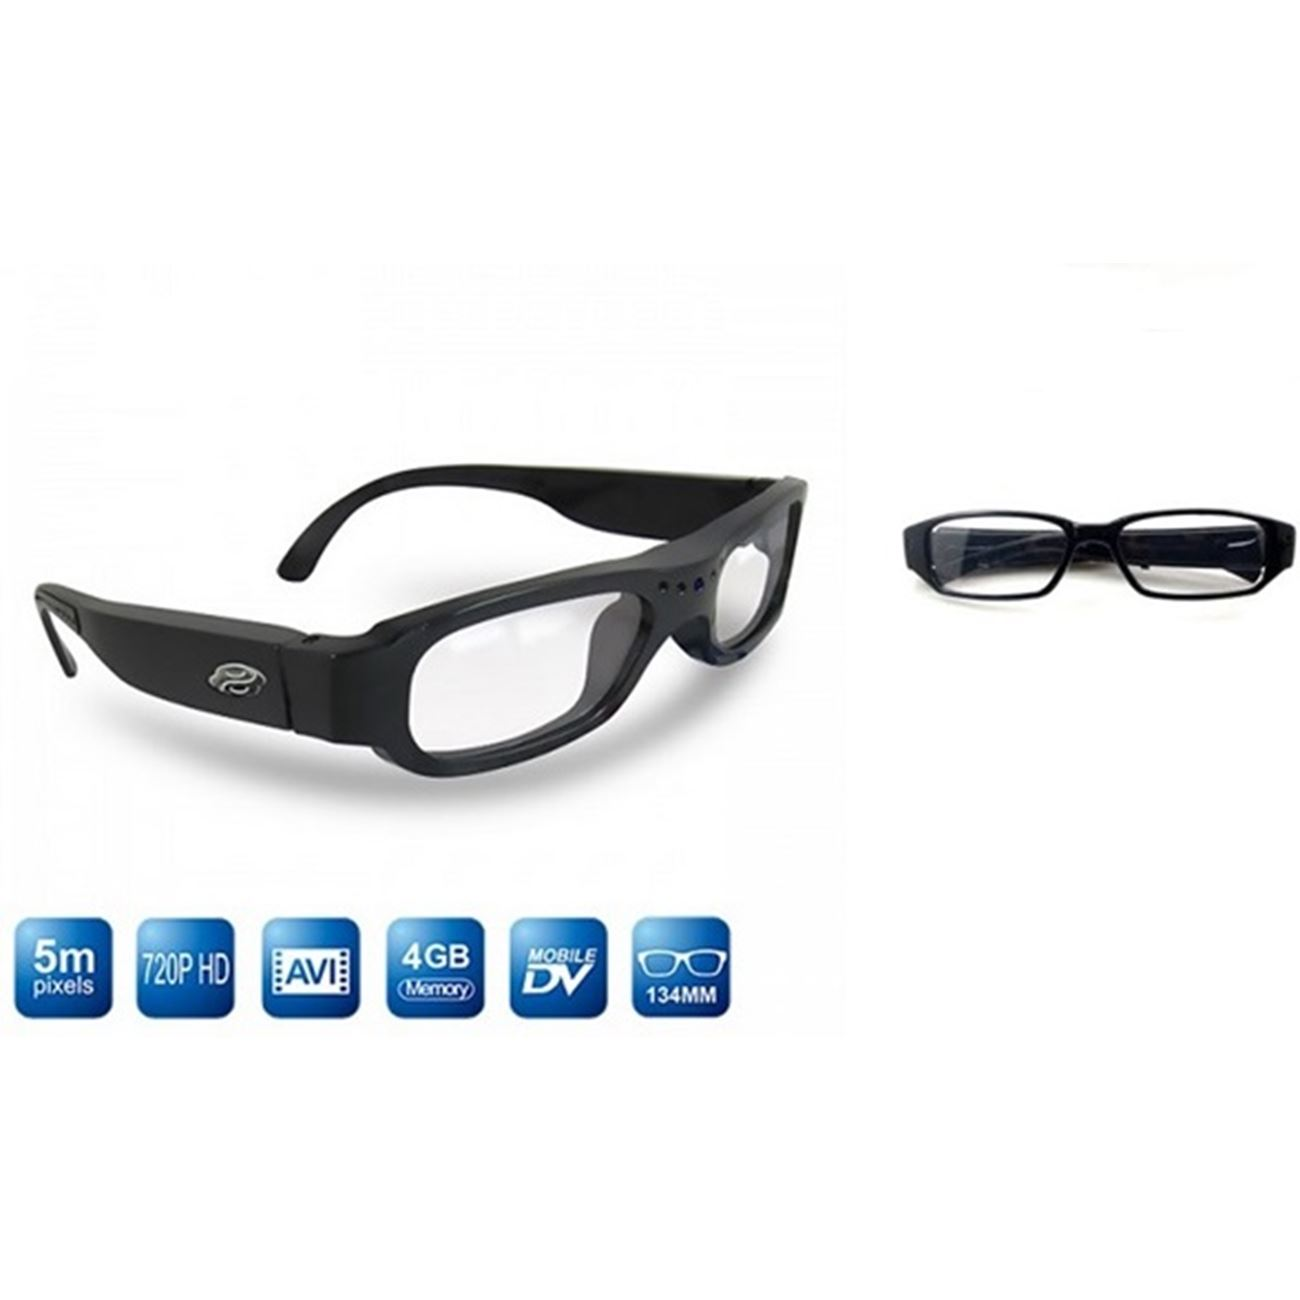 98e883cae1 Κάμερα γυαλιά DVR καταγραφή HD - Αυτόνομο καταγραφικό   Κρυφές Κάμερες  Γυαλιά